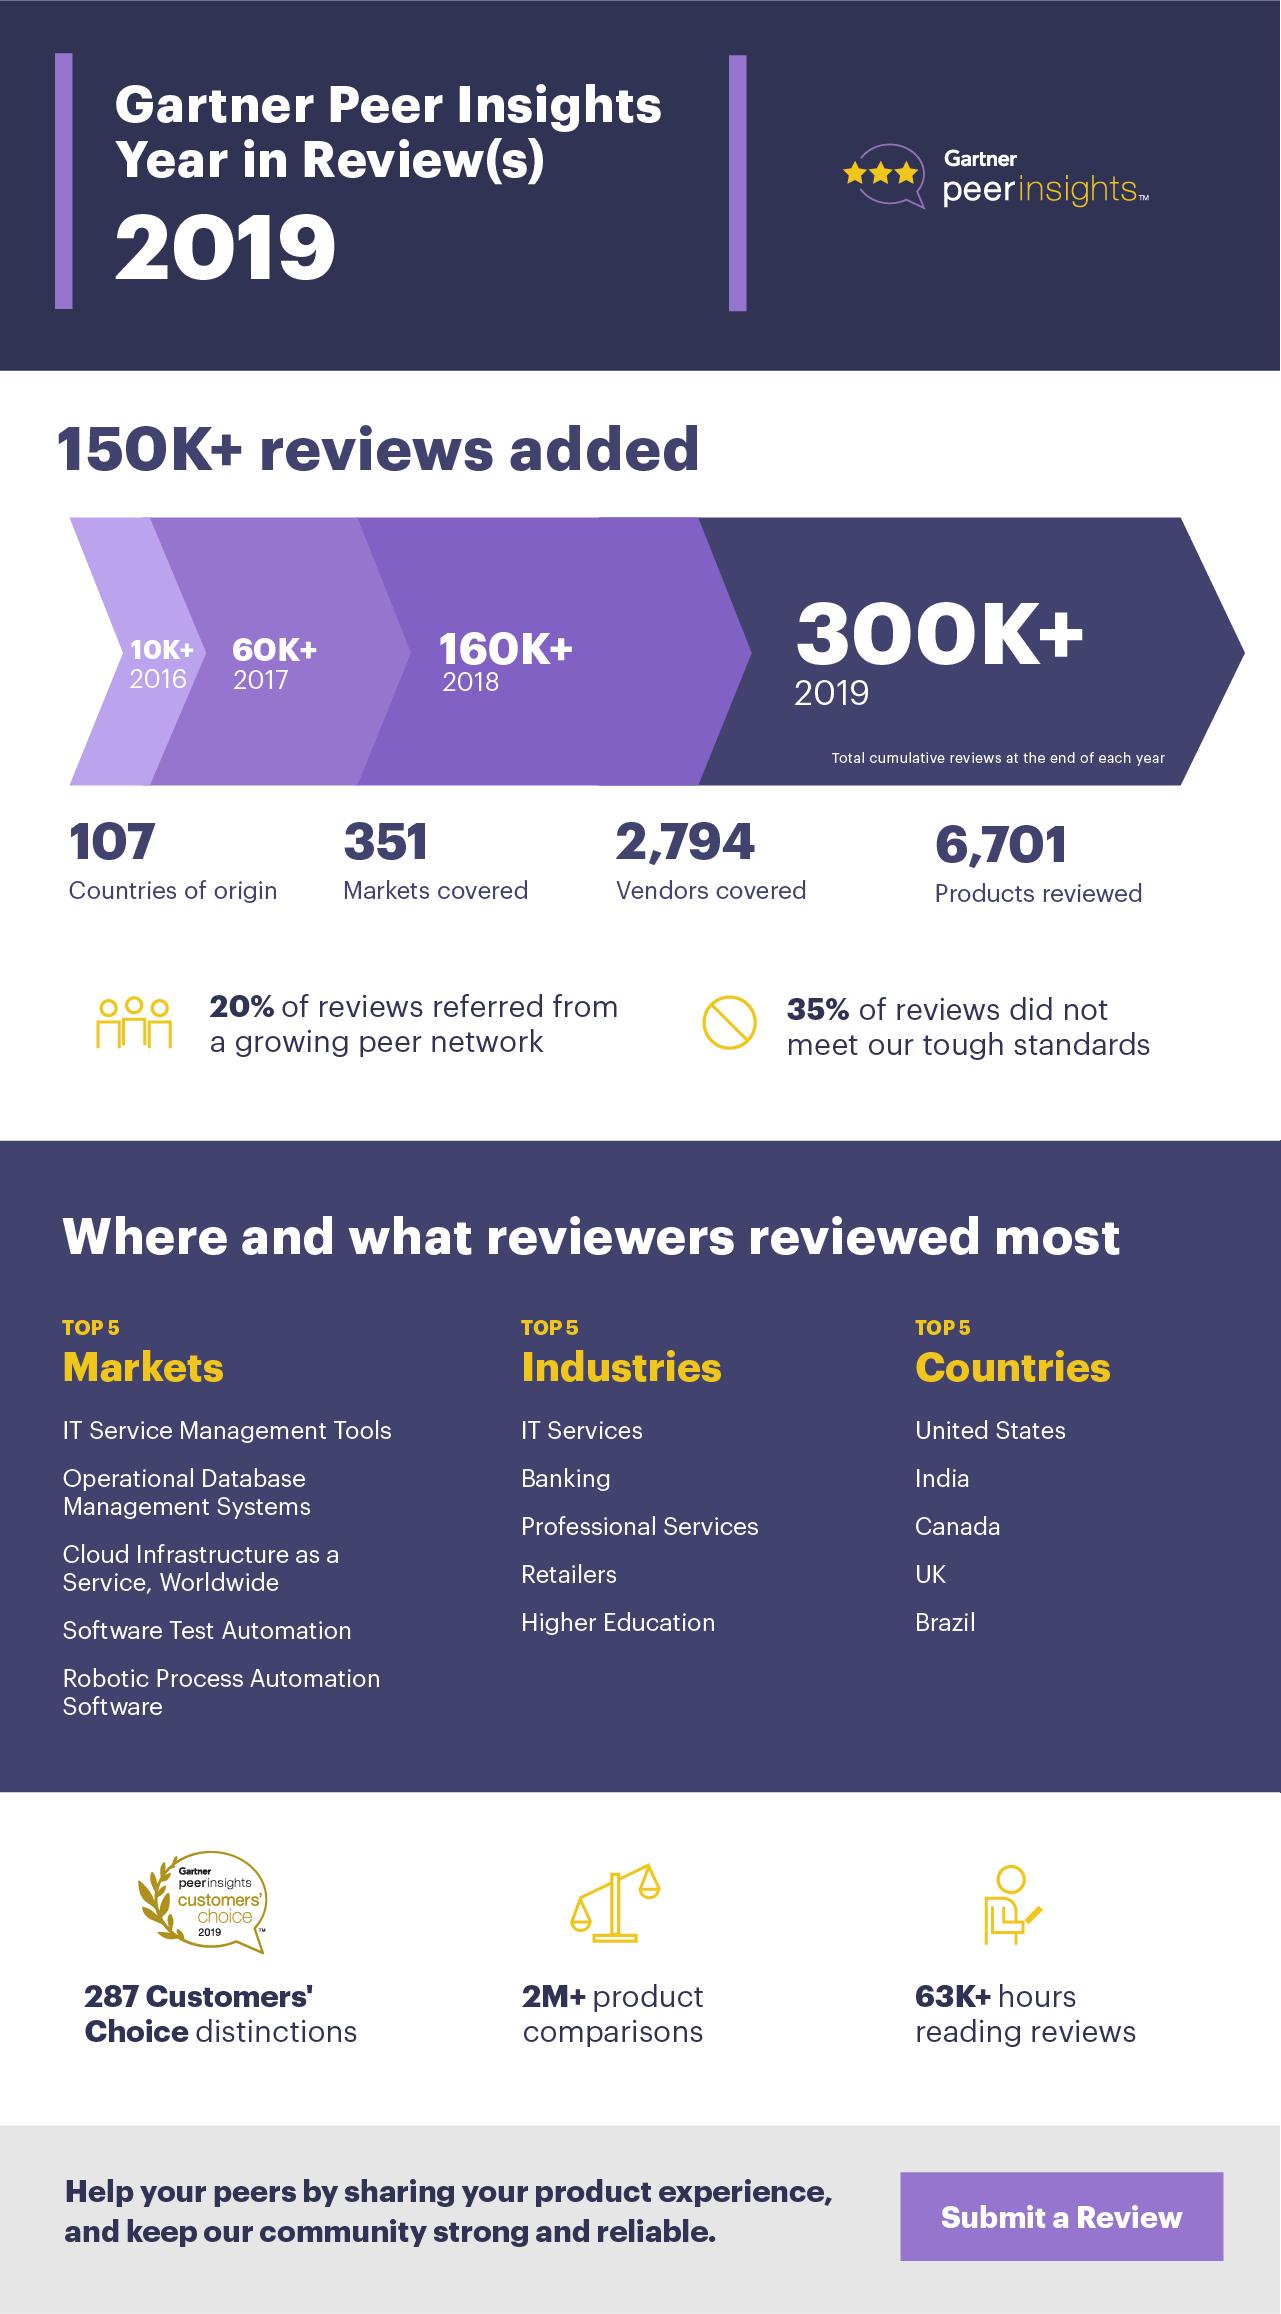 Gartner Peer Insights 2019 Infographic